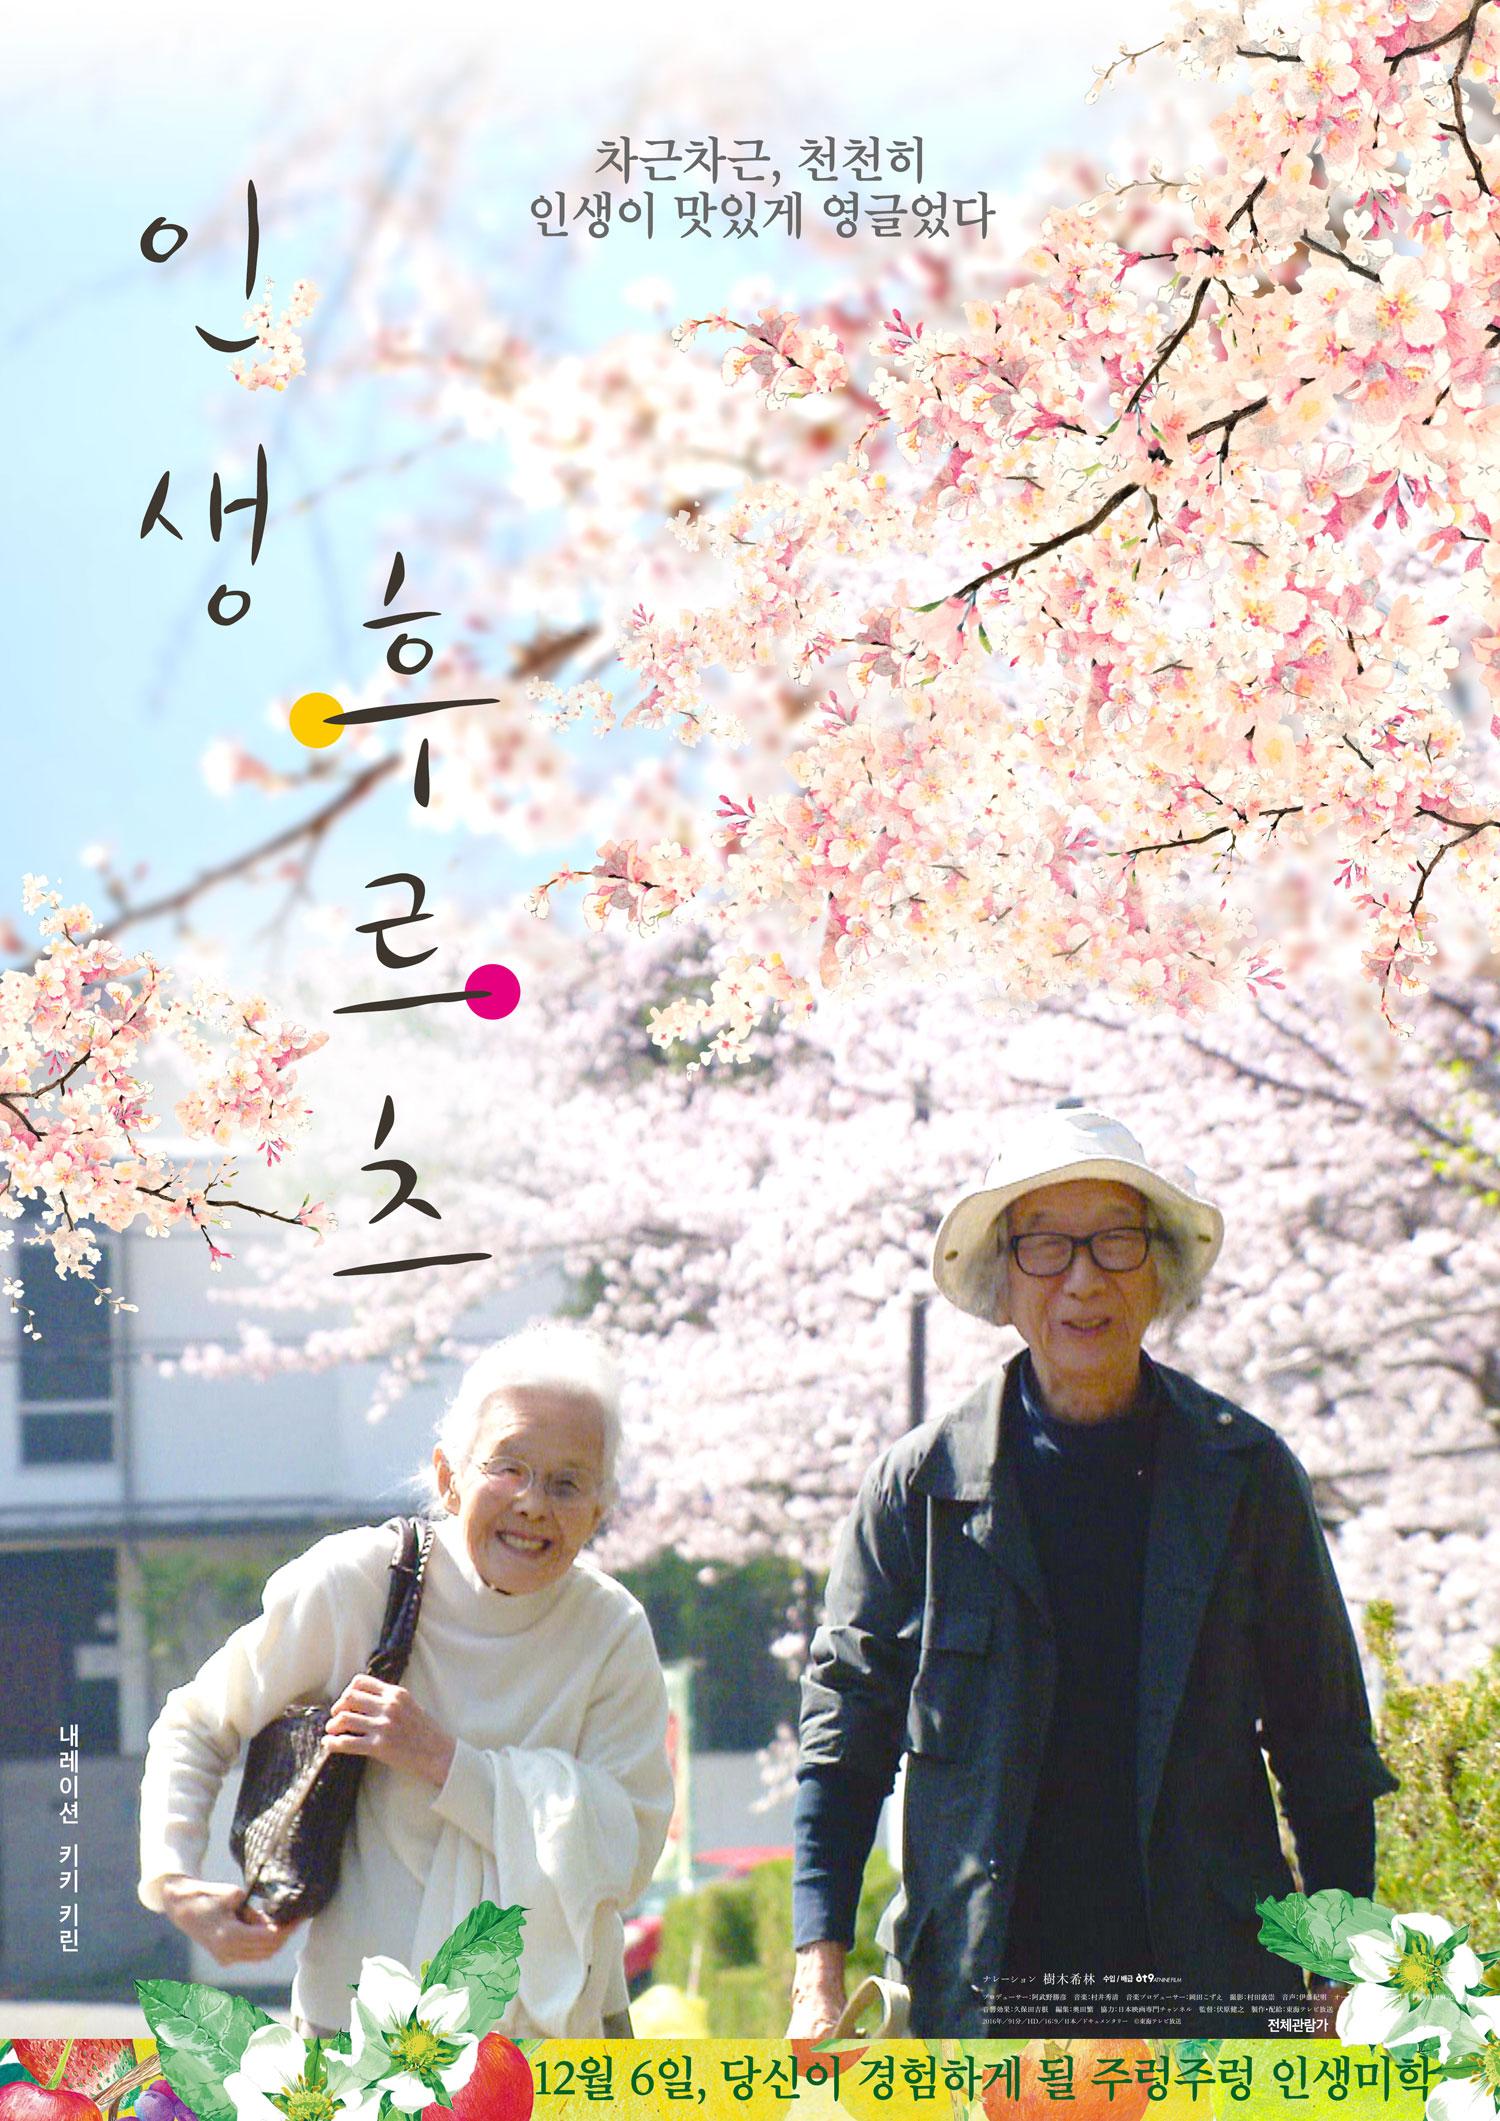 corner_movie_image.jpg